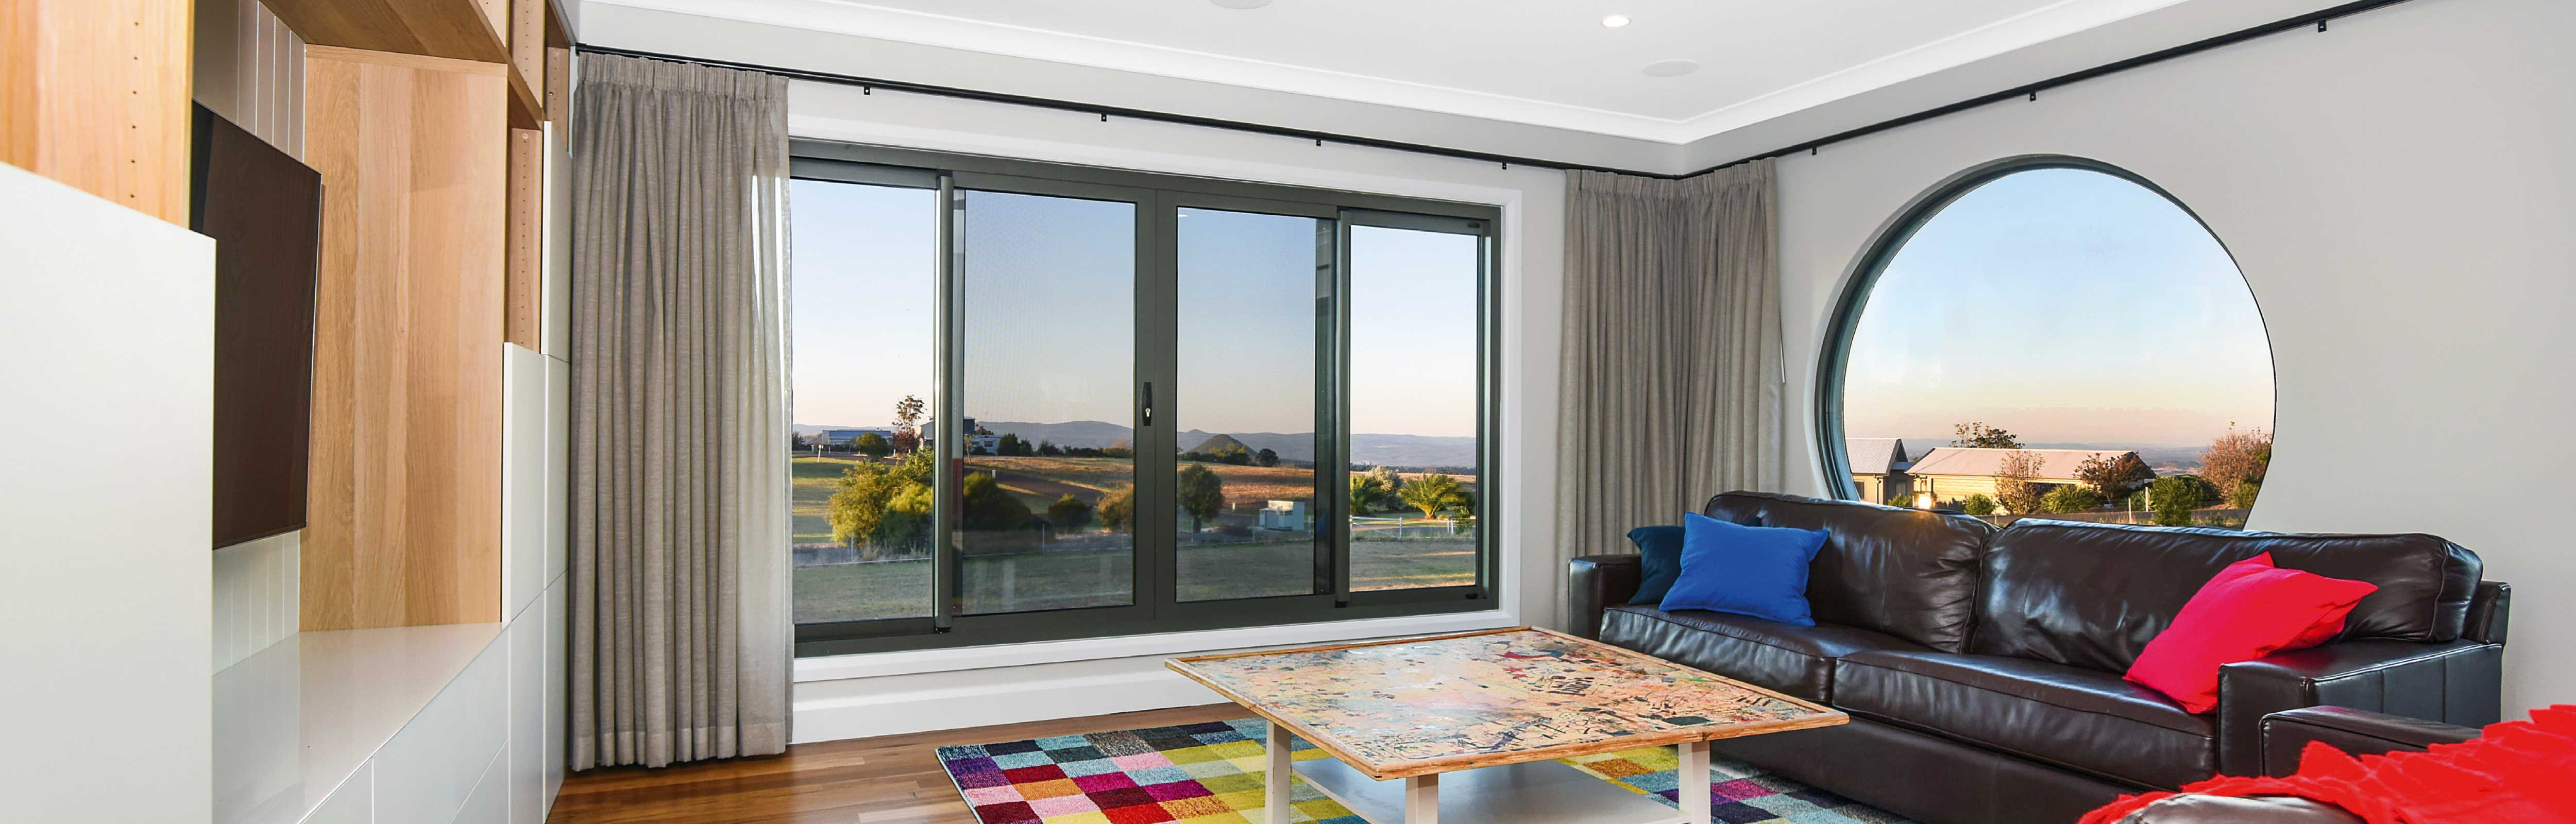 Energy Efficient Thermal Break Windows